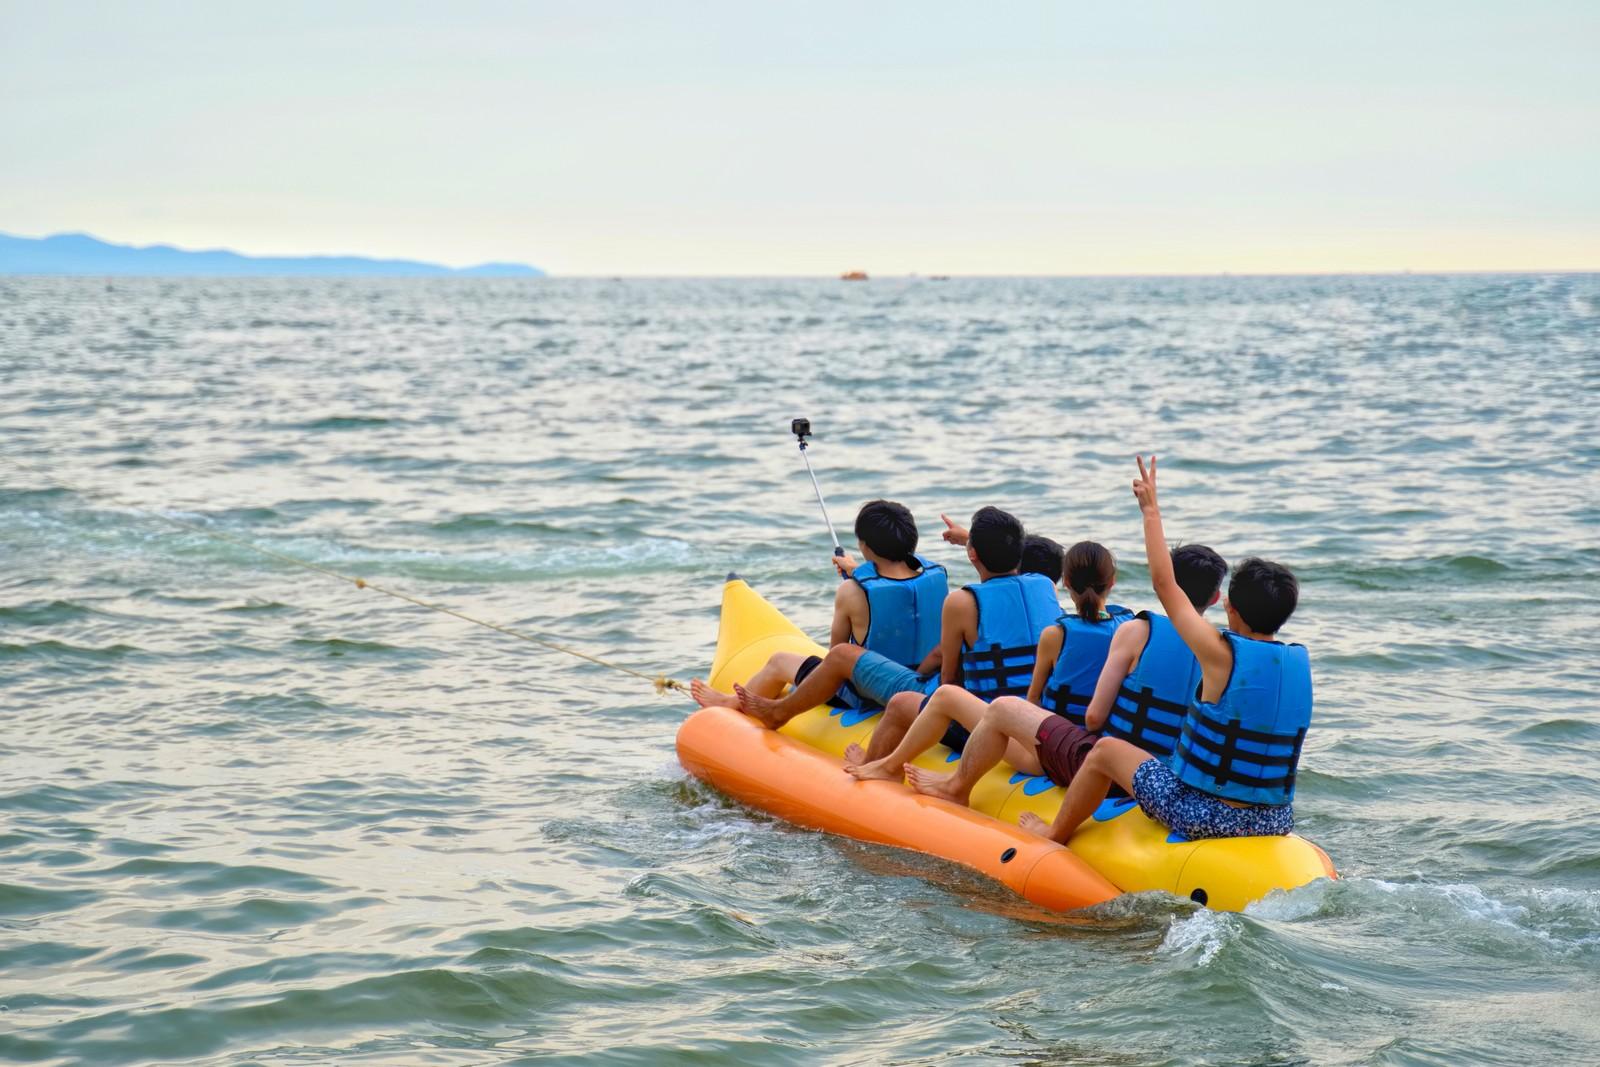 Meet new friends and ride a banana boat at Boracay